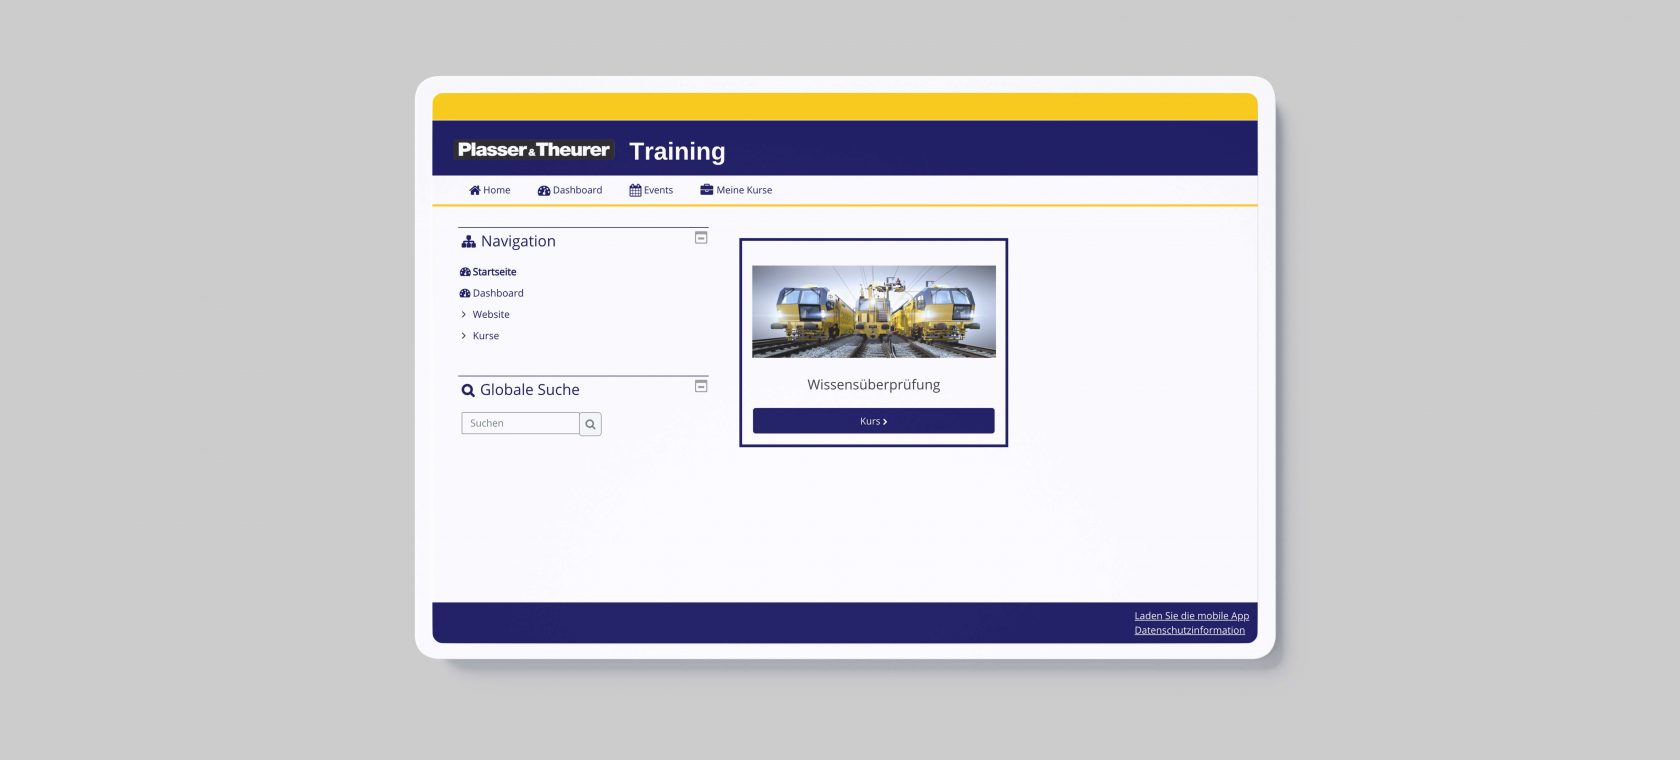 eLearning LMS Plasser & Theurer